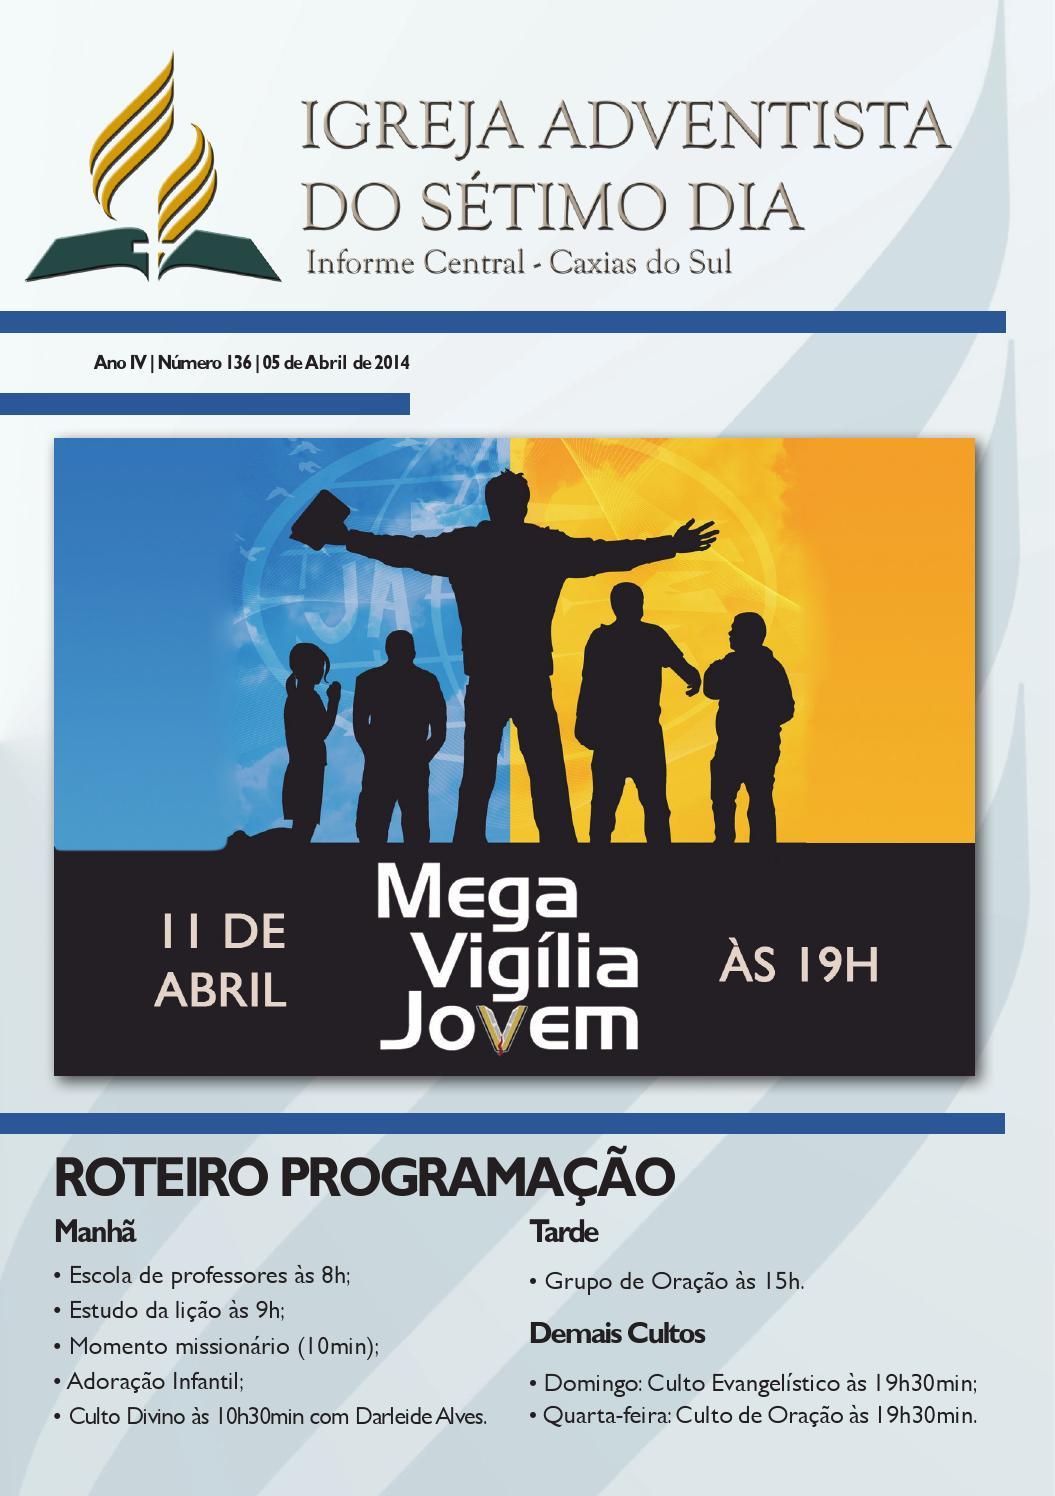 Informativo iasd 05 04 2014 by Igreja Adventista do Sétimo